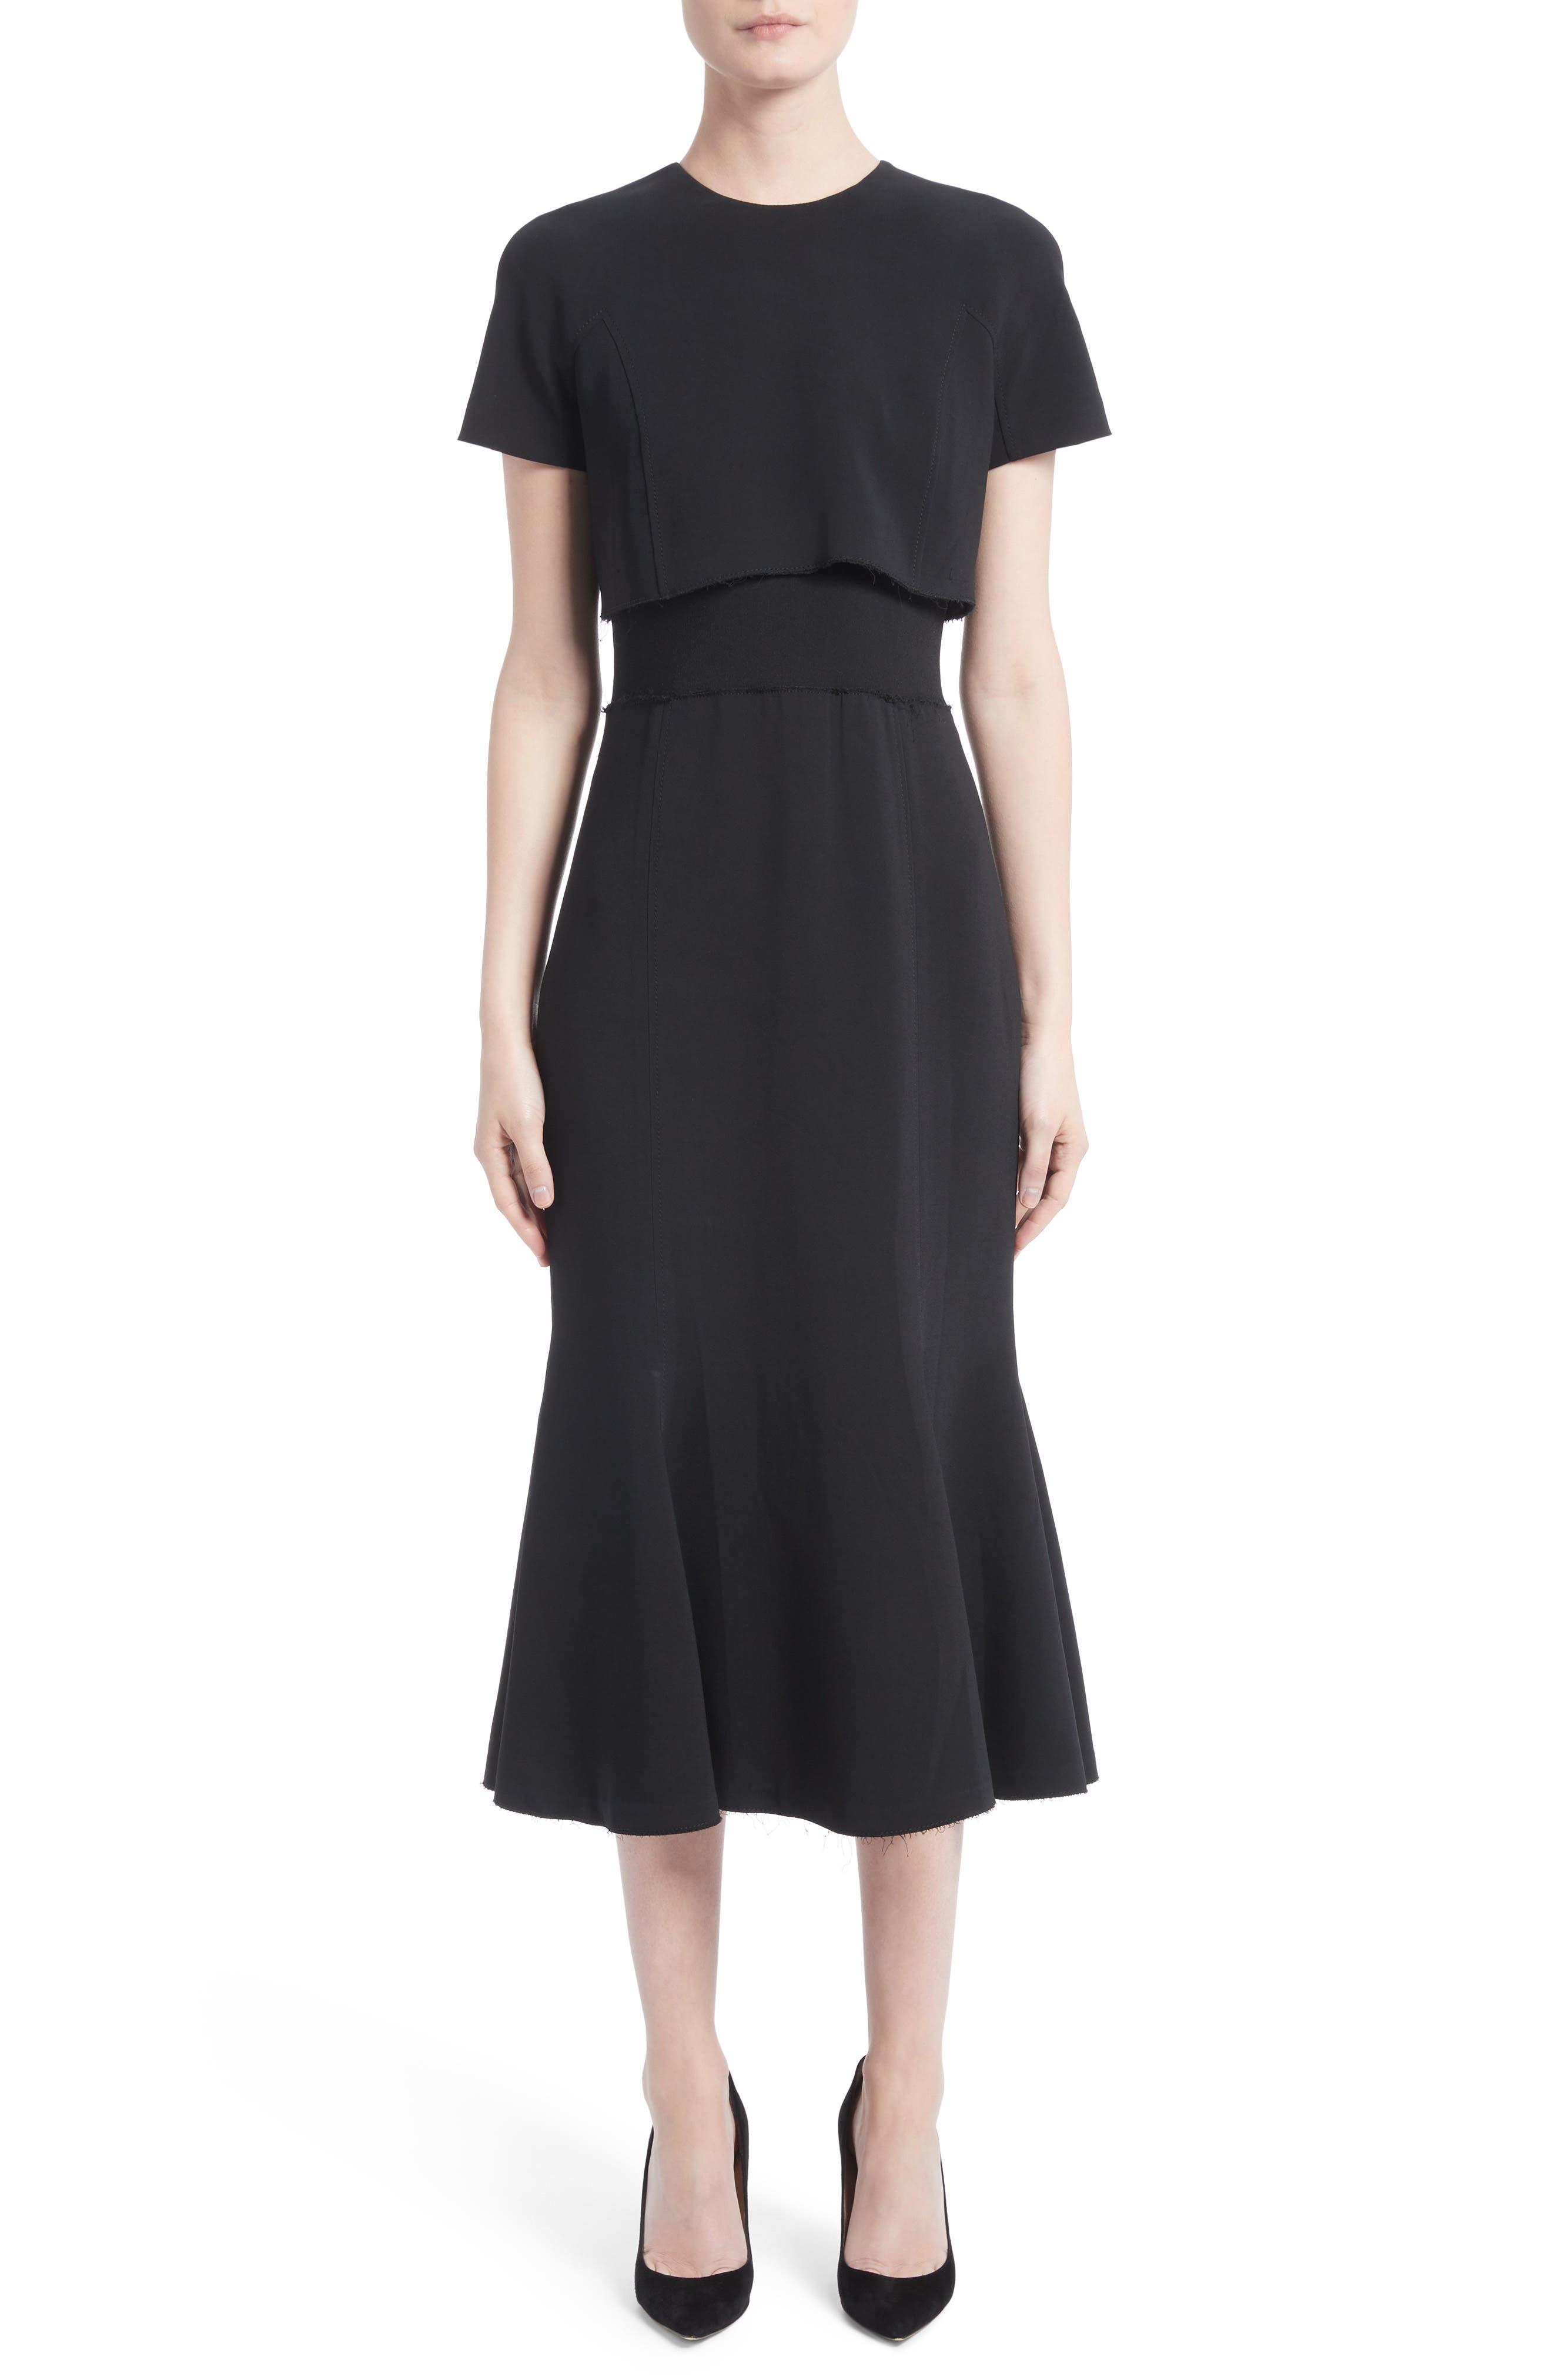 Alternate Image 1 Selected - Proenza Schouler Raw Hem Panel Cady Dress